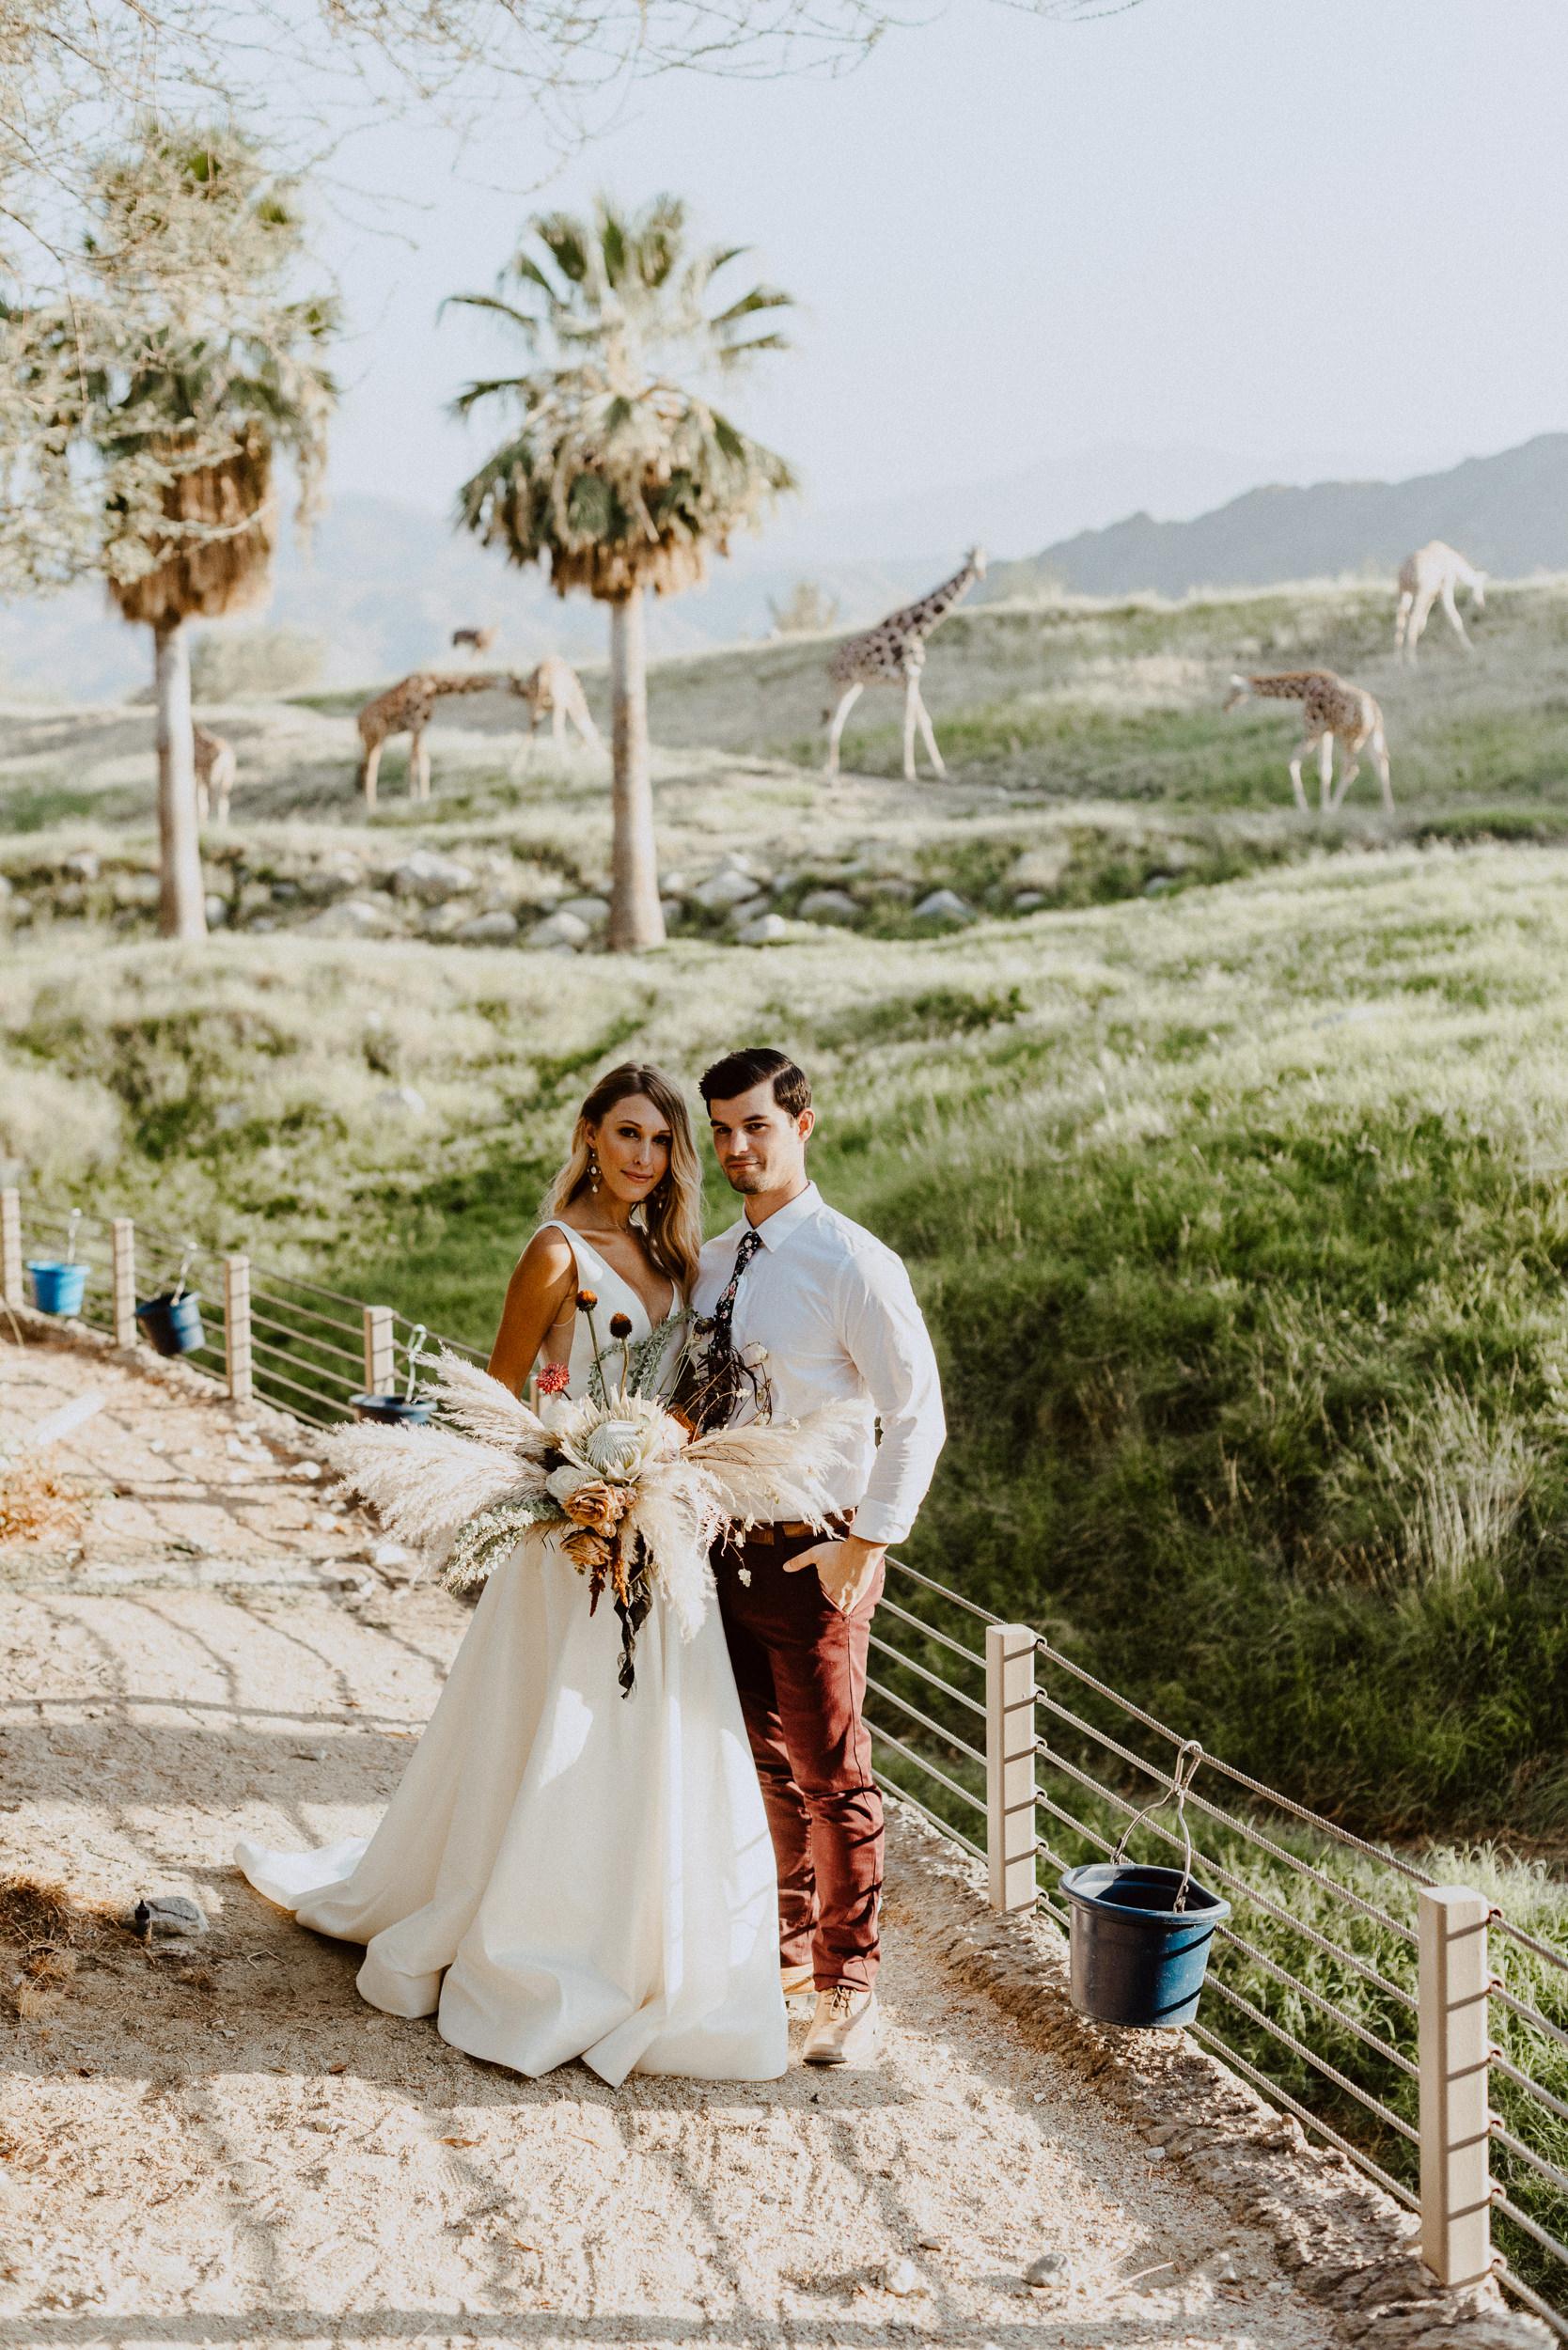 sChelsie + Chris - The Desert Shootout Wedding Romantics at The Living Desert-94.jpg